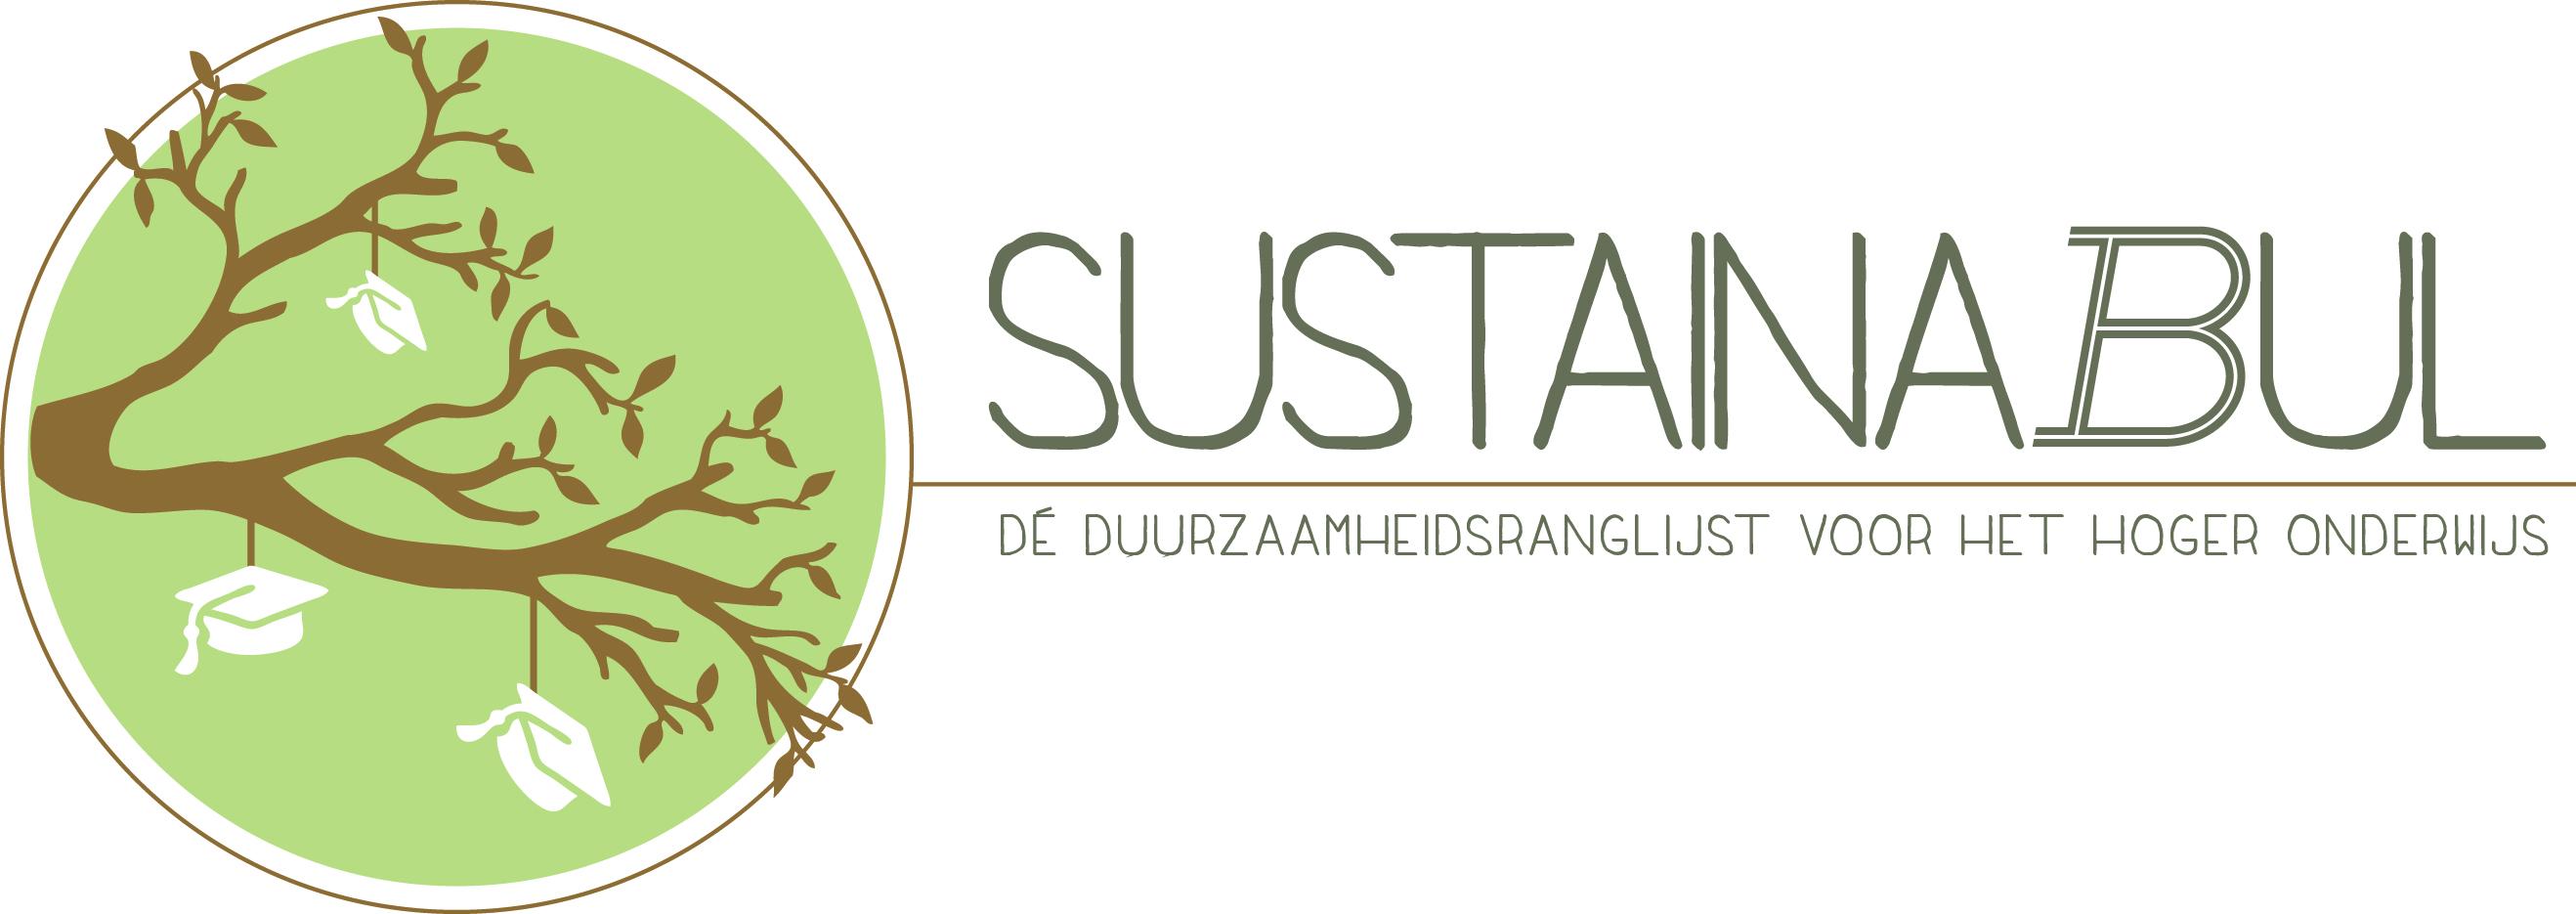 Sustainabul 2014 Onderweg Naar Ontknoping!